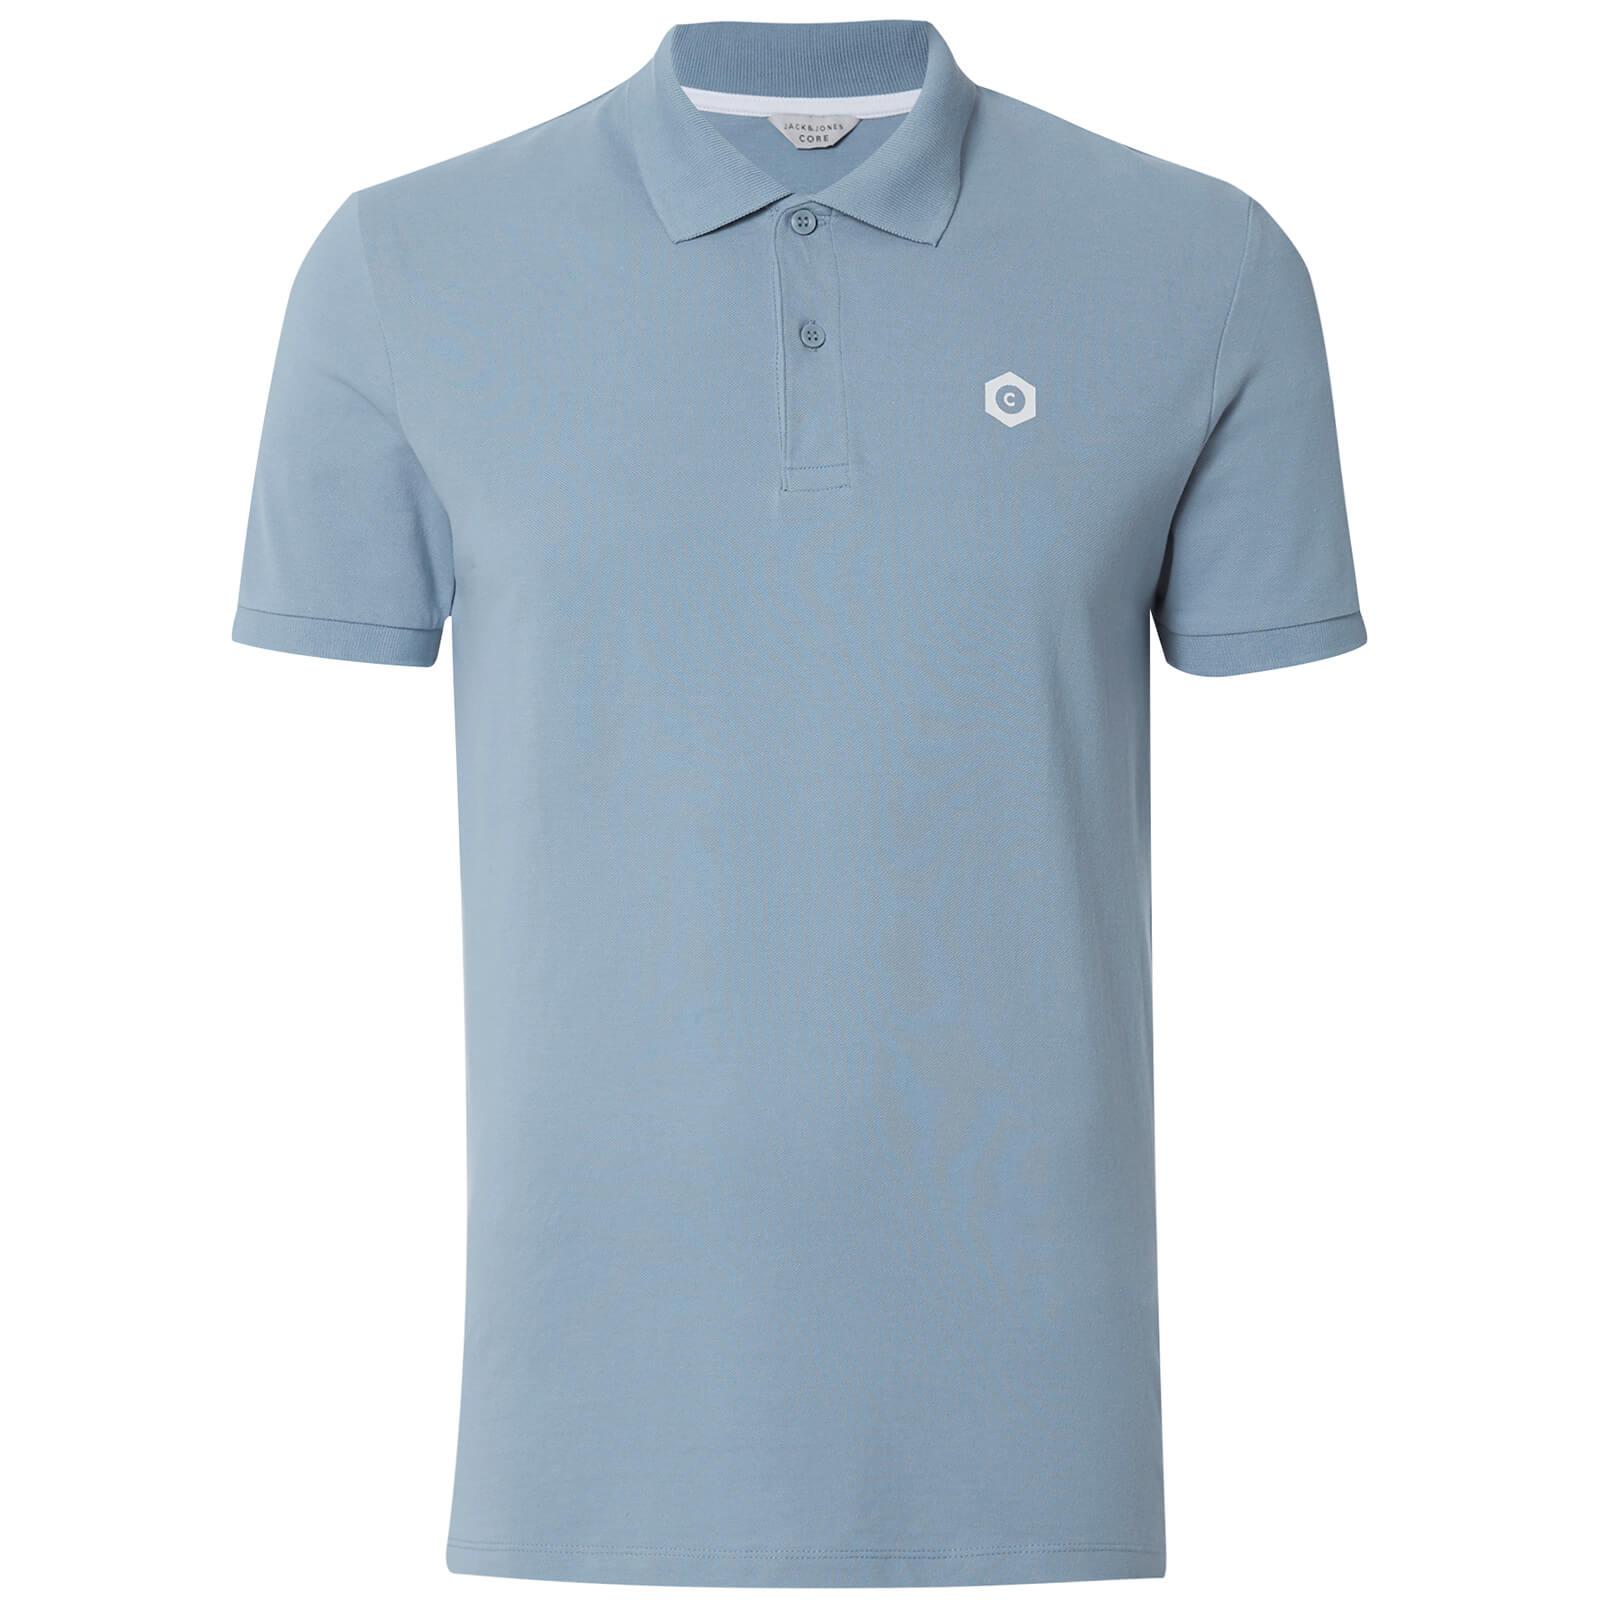 af8a281fb02045 Jack   Jones Core Men s Booster Logo Polo Shirt - Faded Denim ...